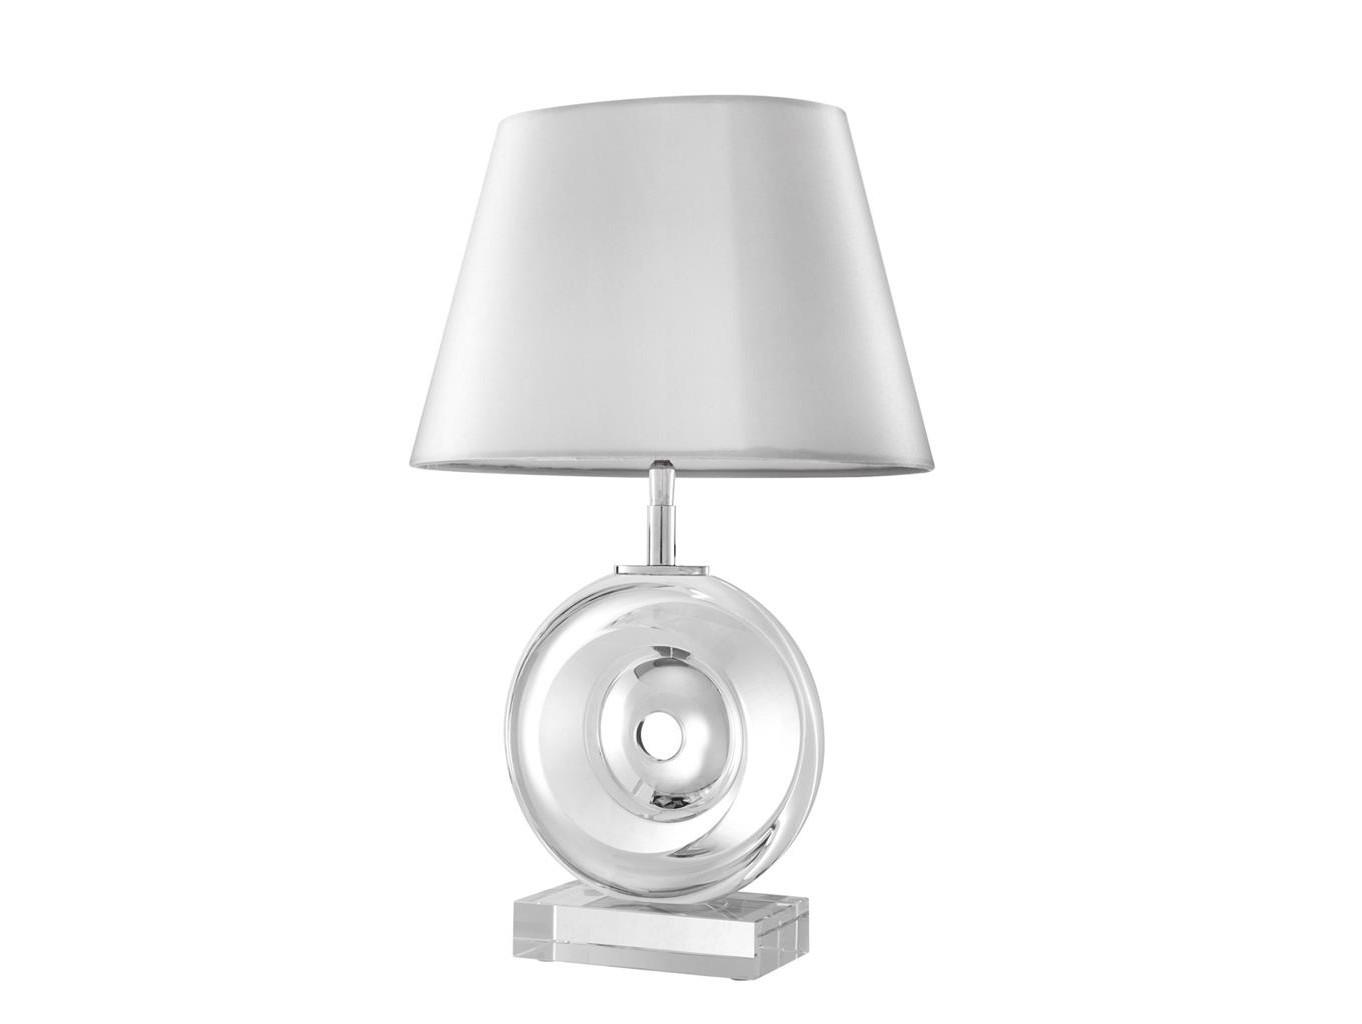 Настольная лампа RemyДекоративные лампы<br>Текстильный абажур белого цвета скрывает лампу.&amp;amp;nbsp;<br><br>Material: Стекло<br>Ширина см: 32<br>Высота см: 50.0<br>Глубина см: 32